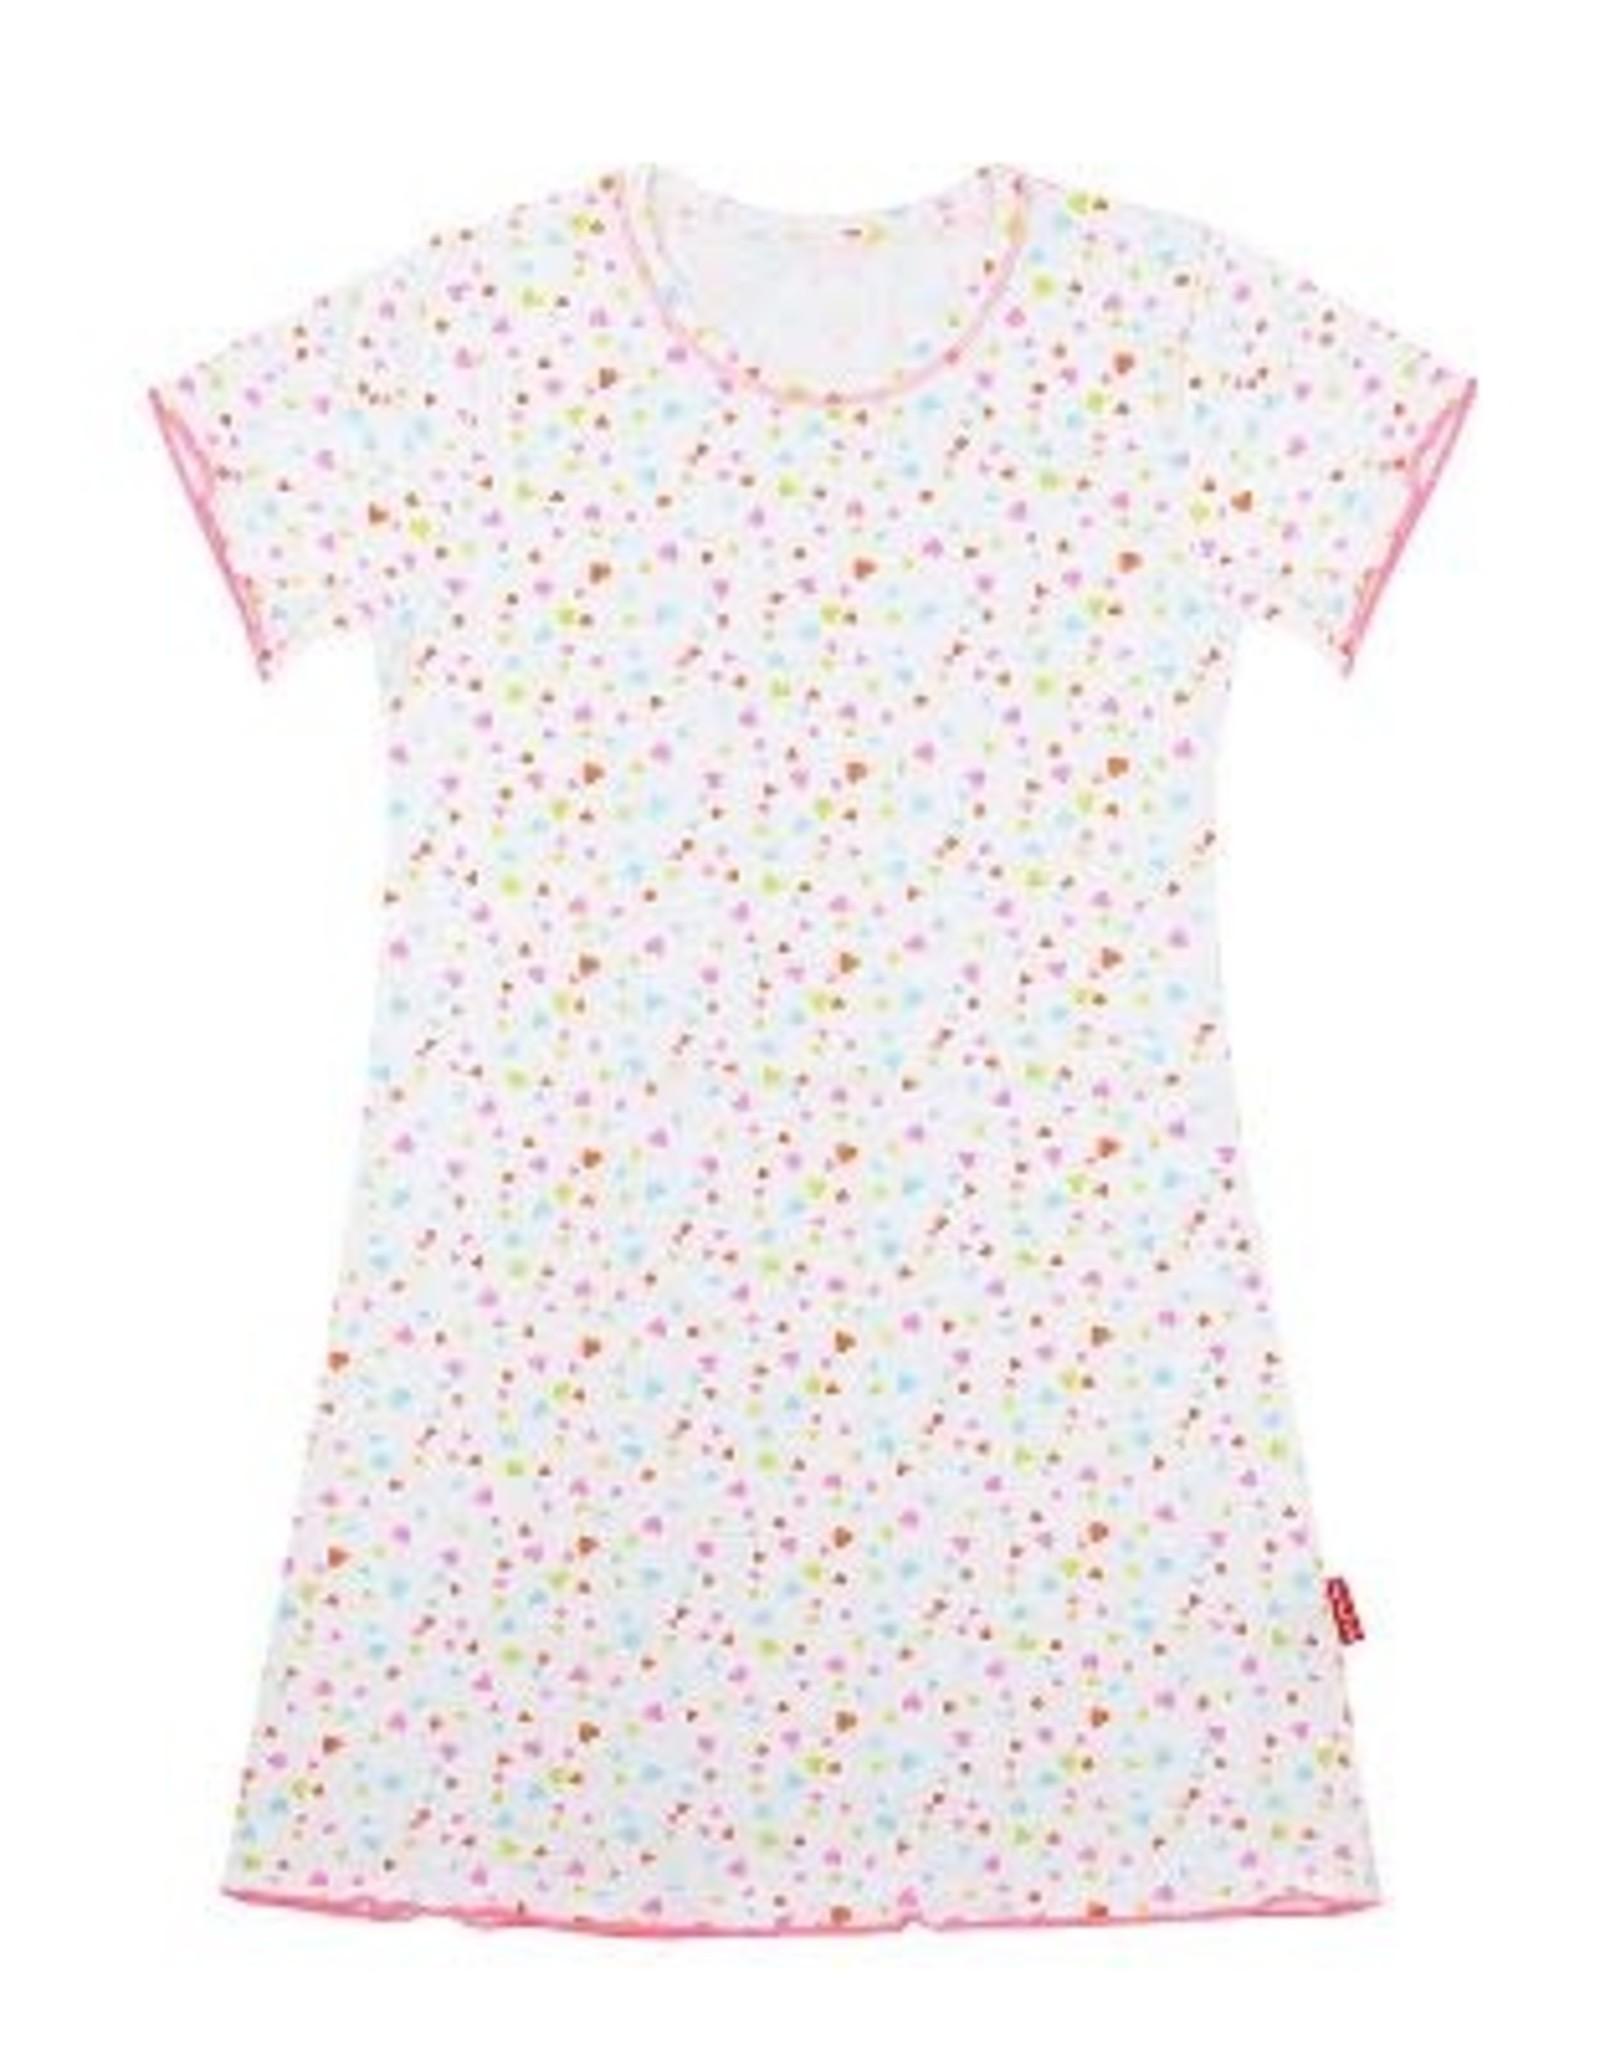 CLAESEN'S CLAESEN'S pyjama panther hearts